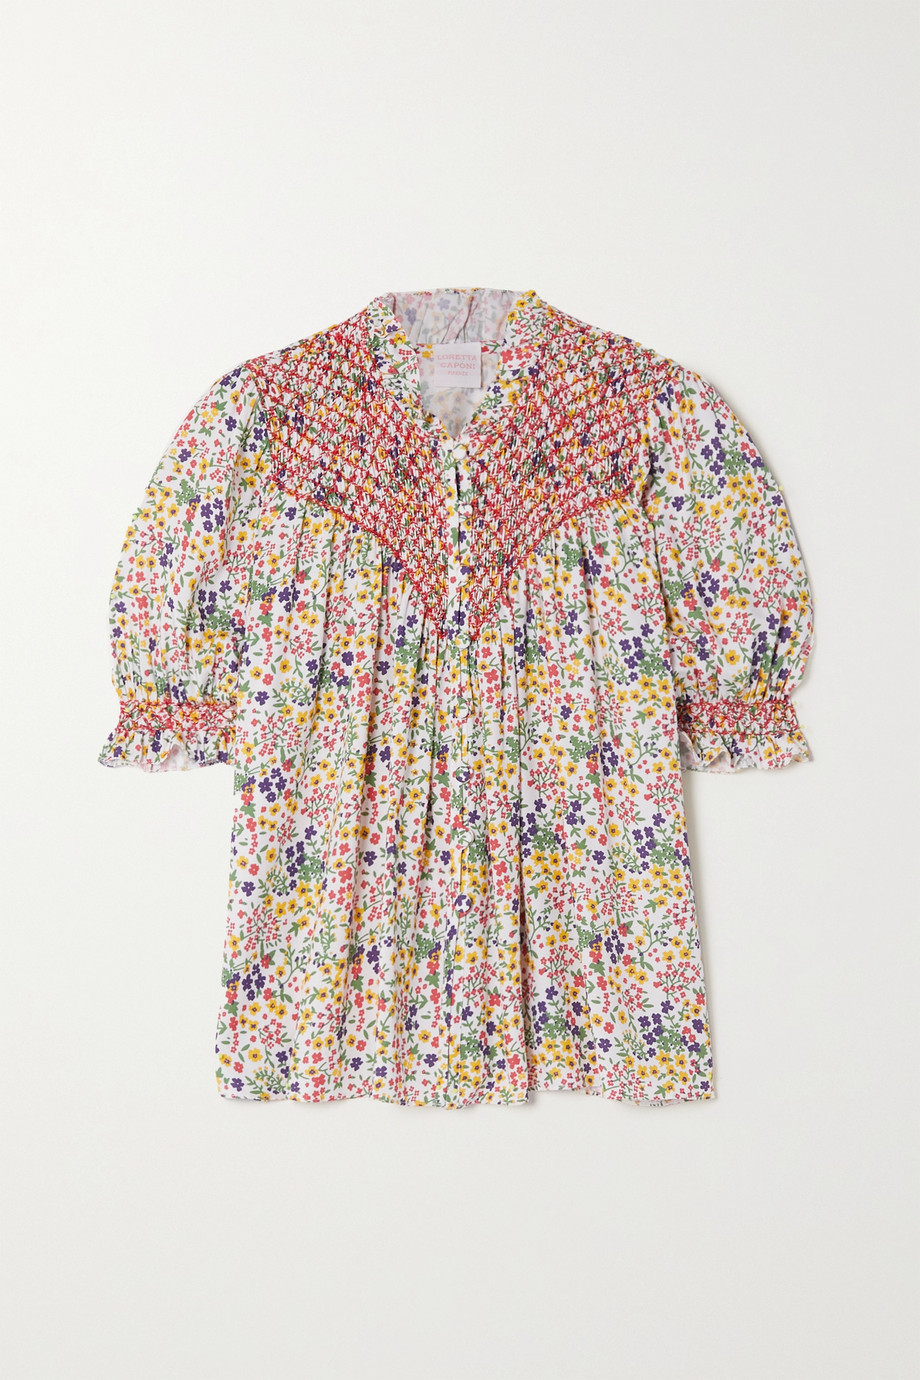 Loretta Caponi Milvia ruffled smocked floral-print poplin blouse